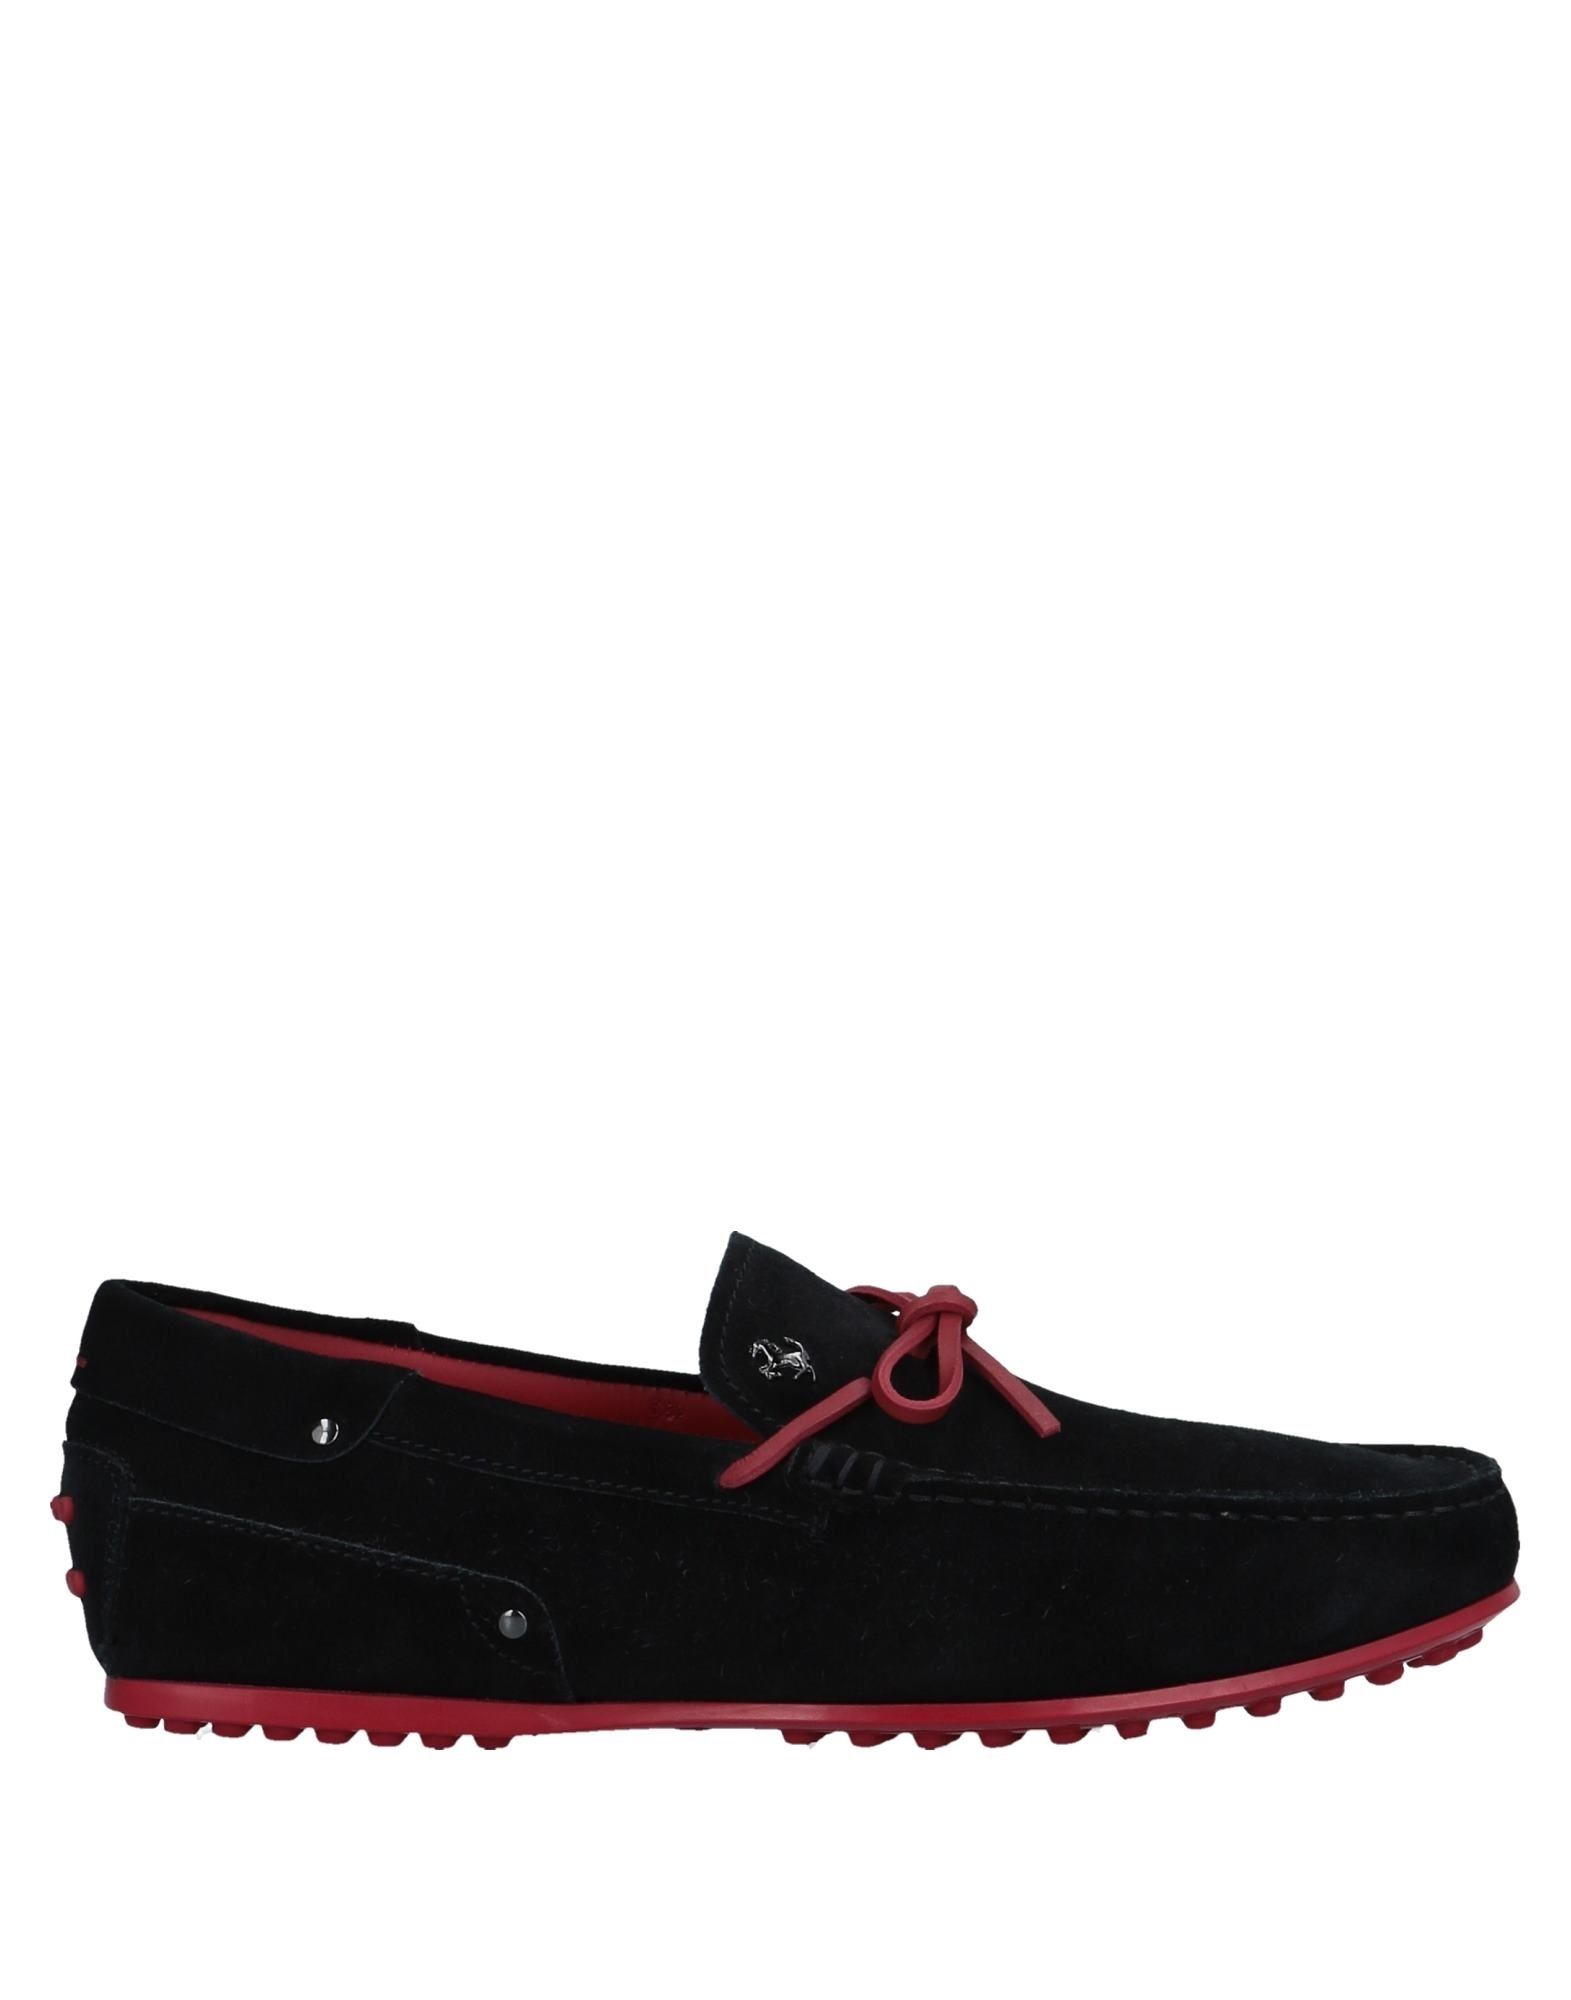 Tod's Mokassins Herren  11541508QW Gute Qualität beliebte Schuhe